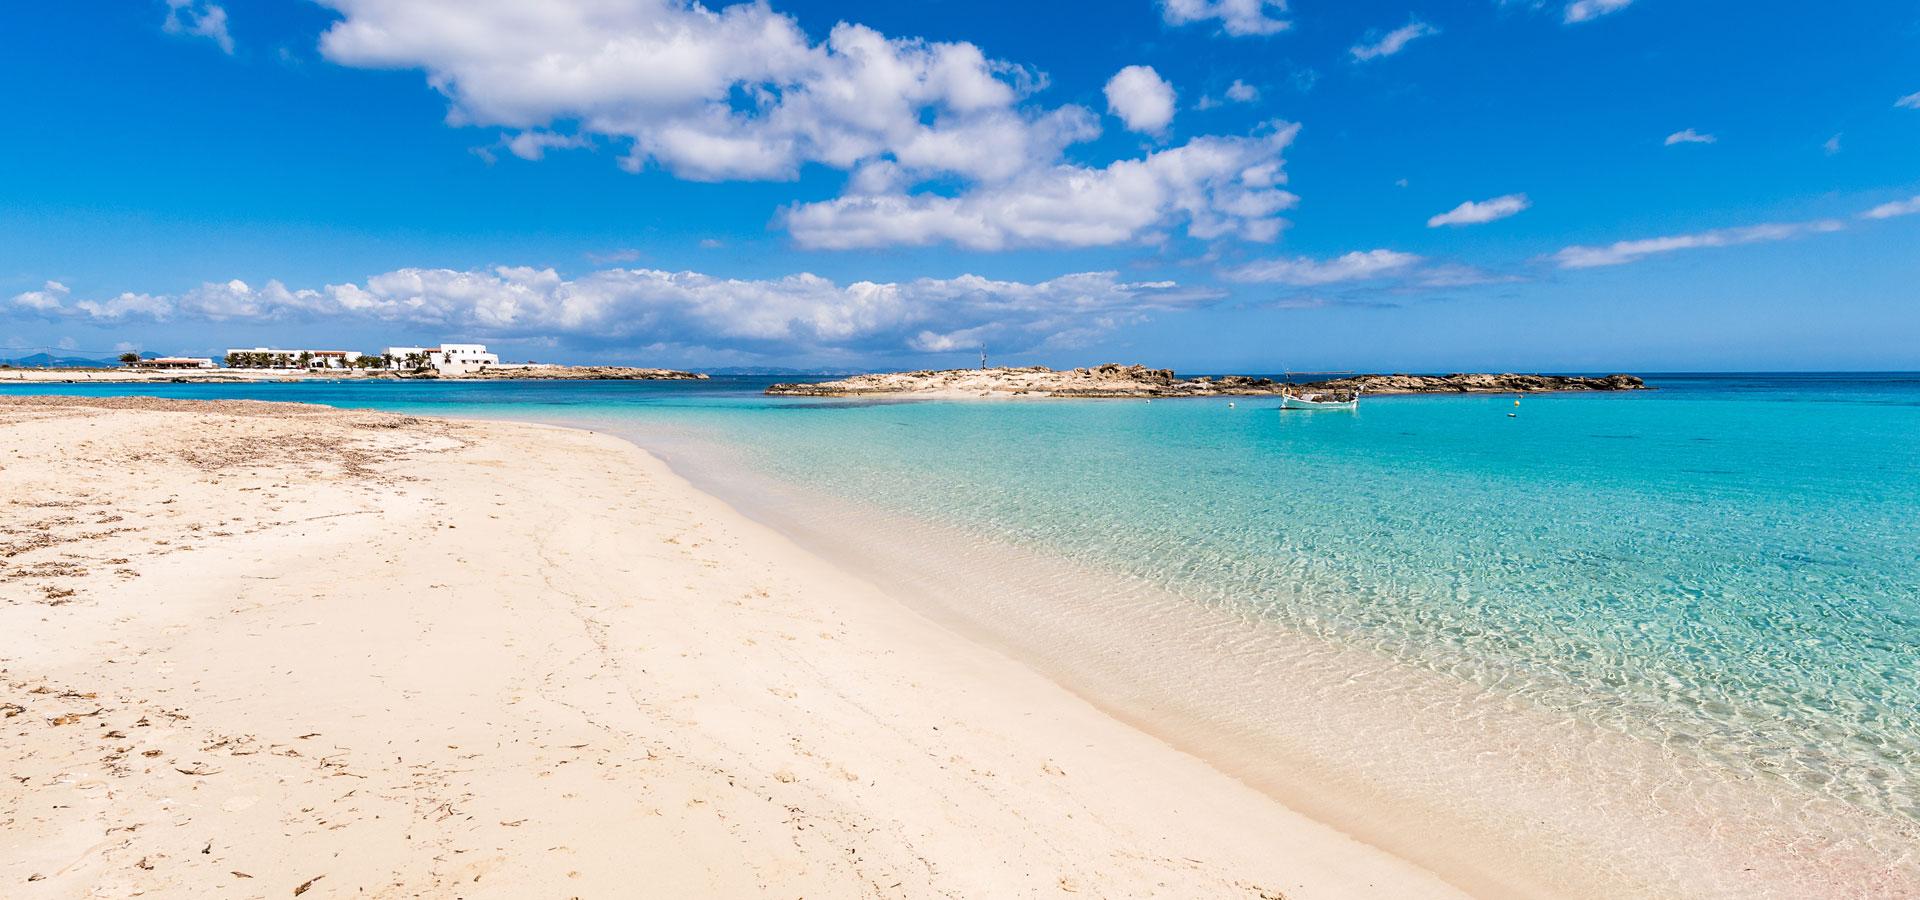 Spiaggia Es Pujols - affitto formentera